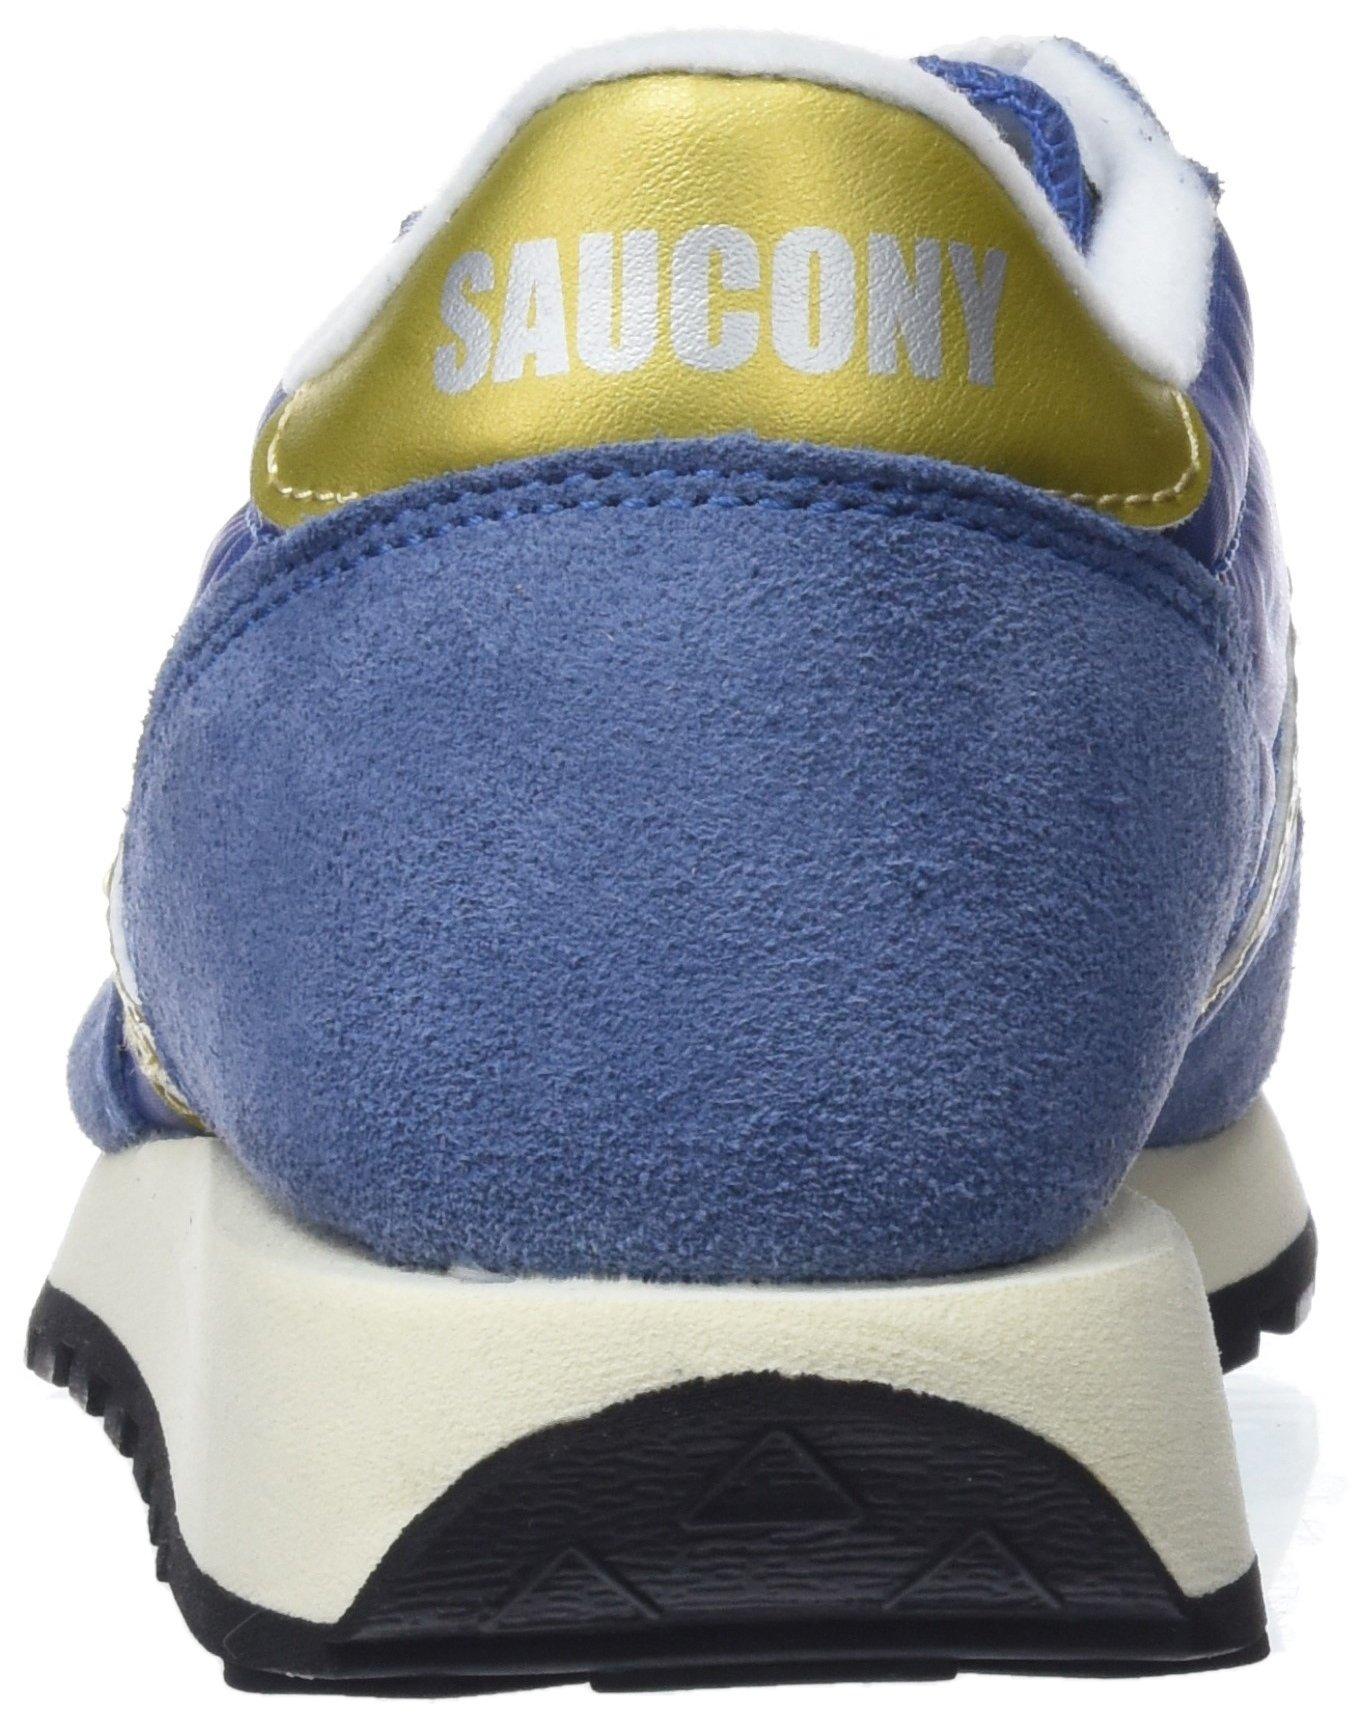 Saucony Jazz Original Vintage, Sneaker Basse Donna 2 spesavip